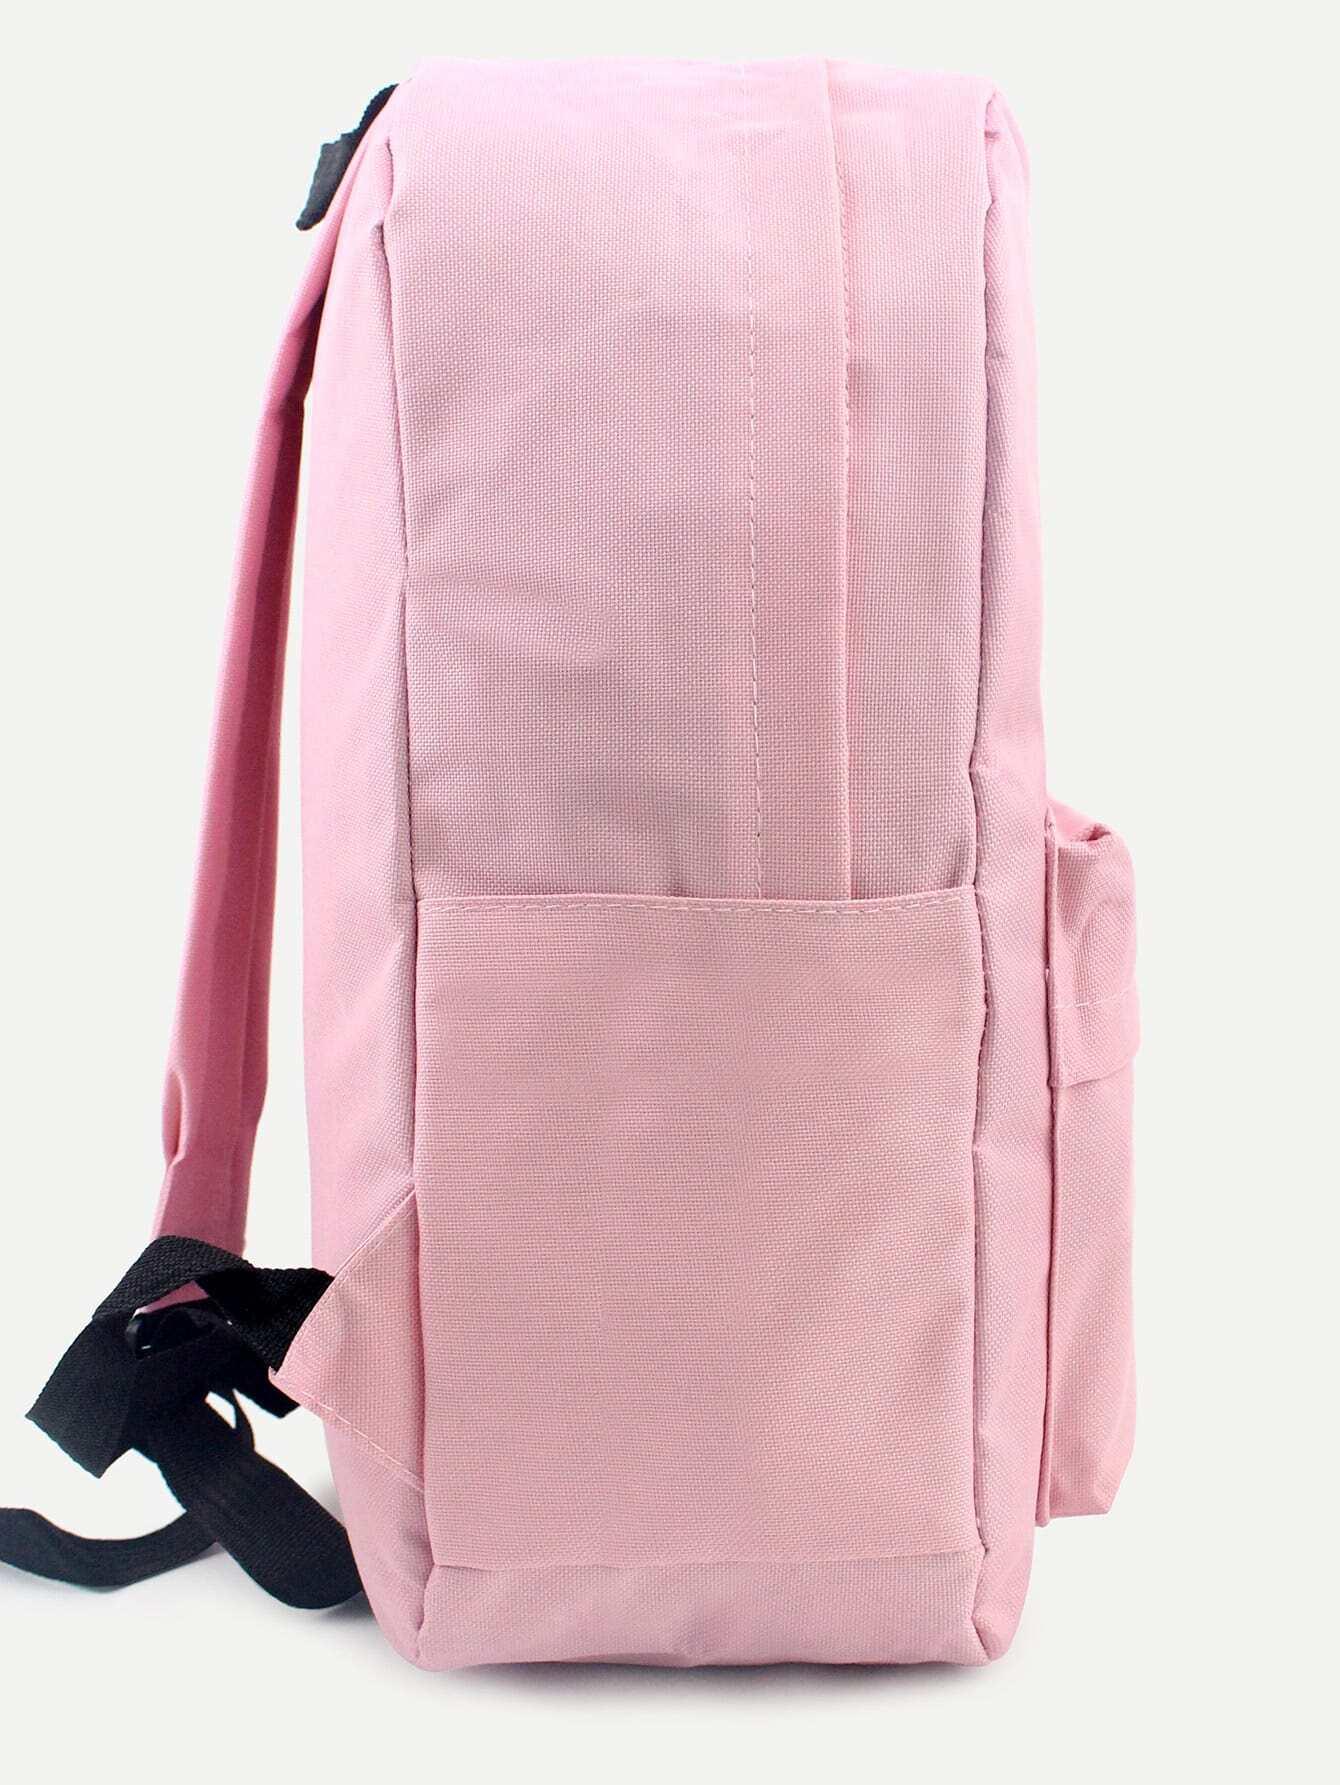 bag160901315_2